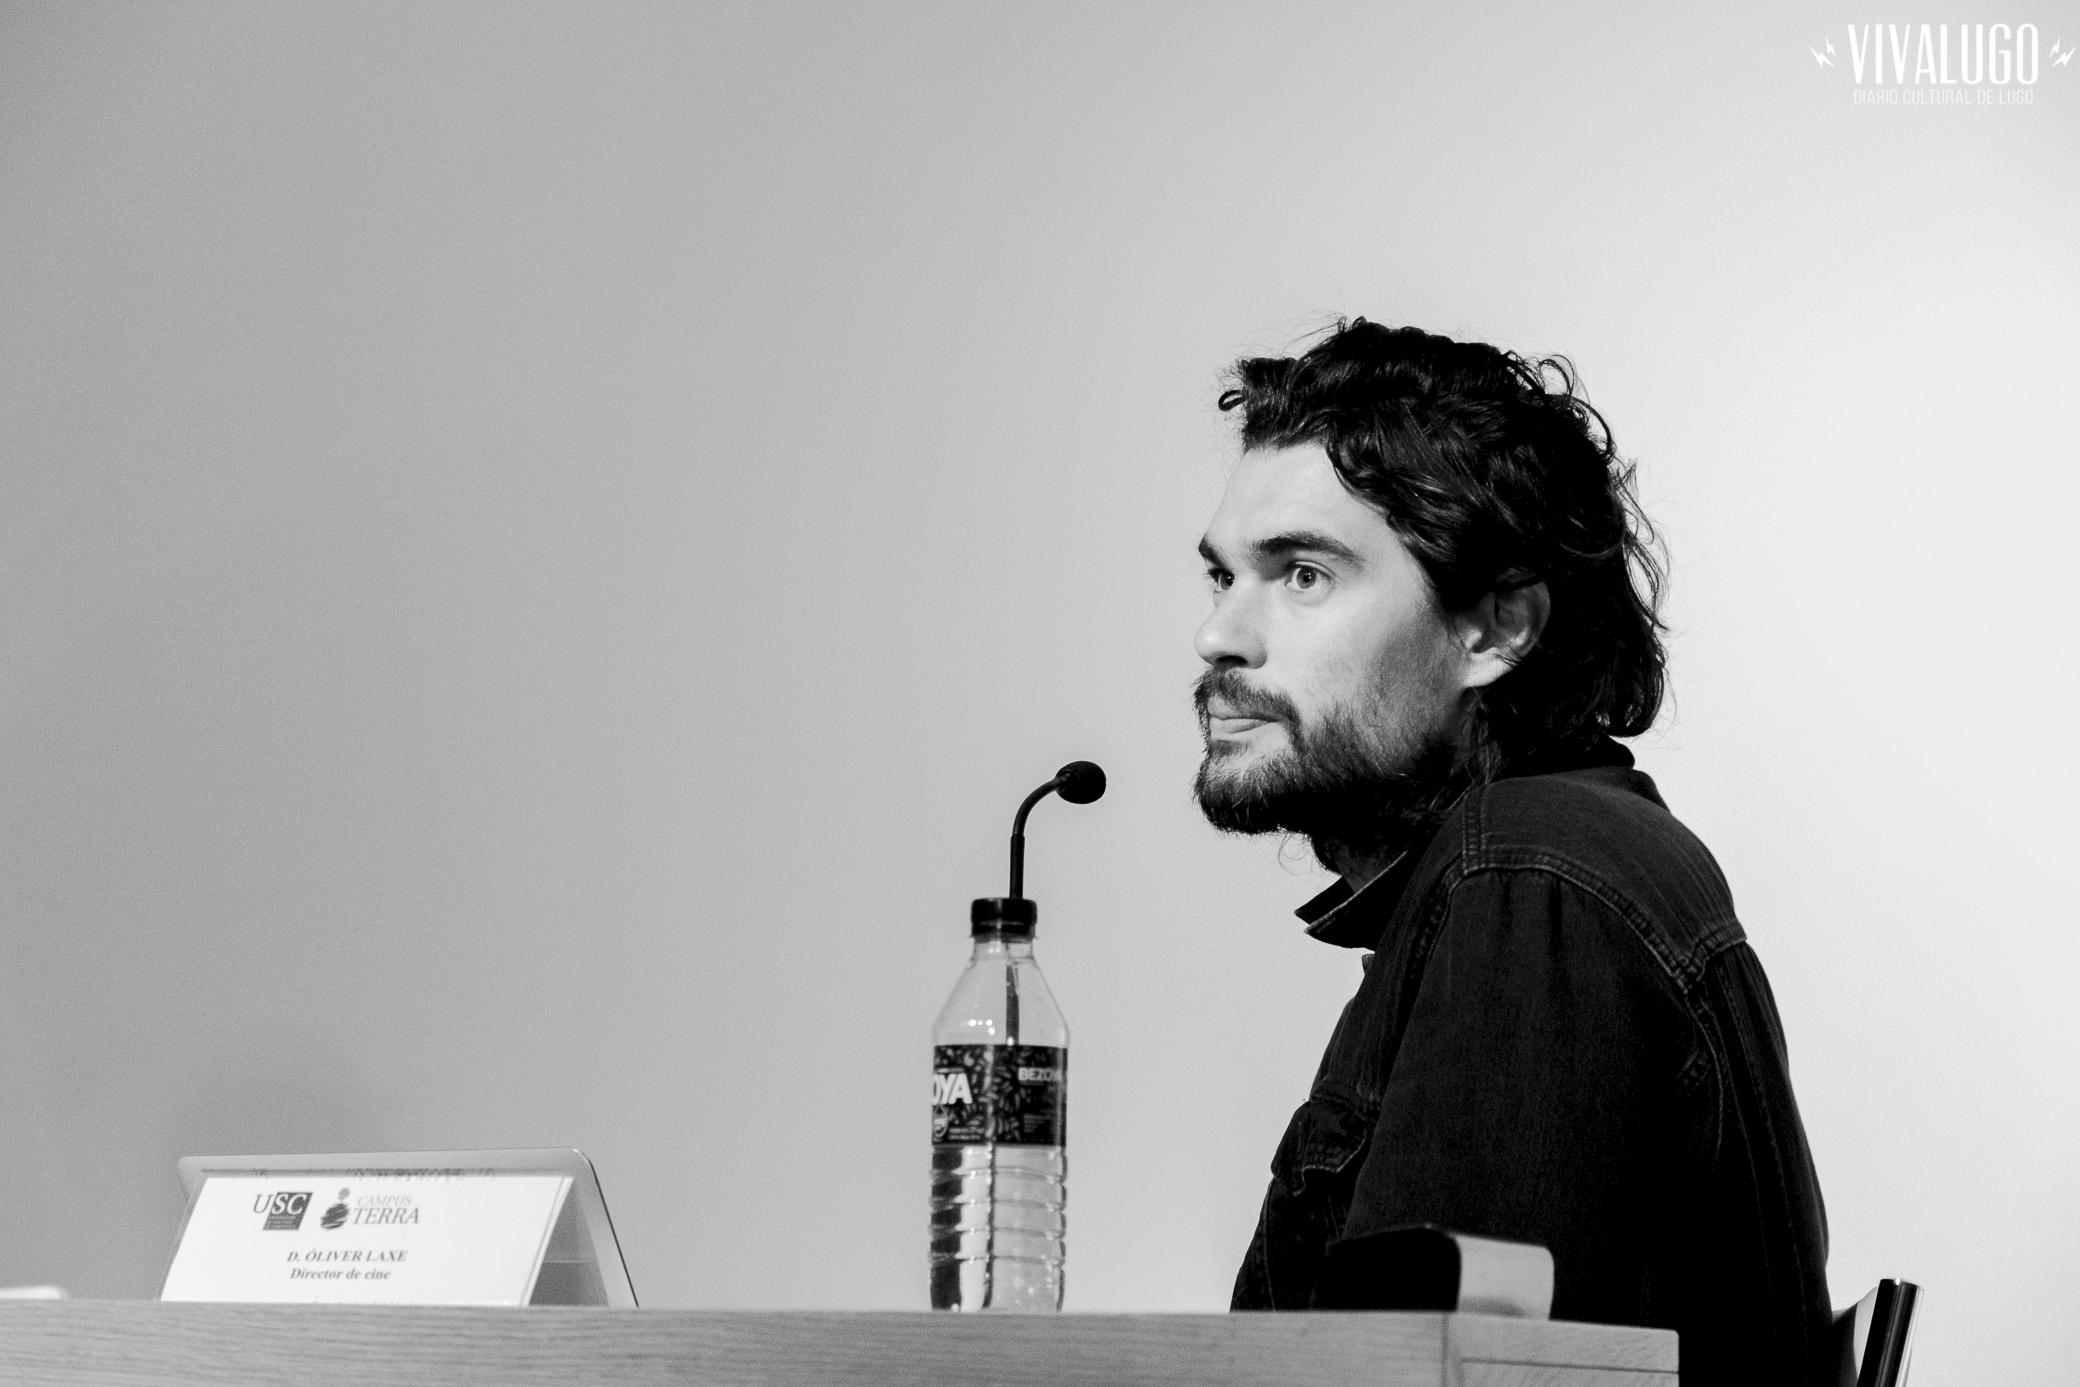 Foto de Loopez para Viva Lugo Oliver Laxe.